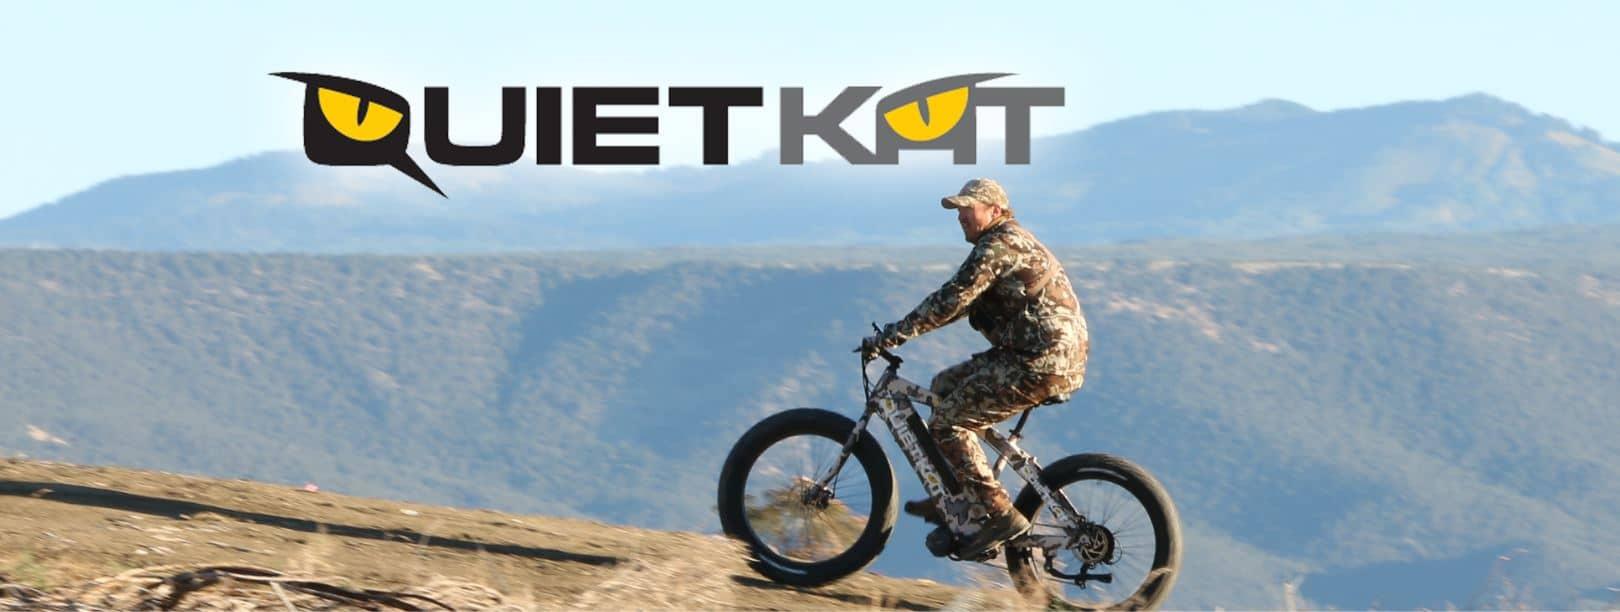 quietcat bikes review